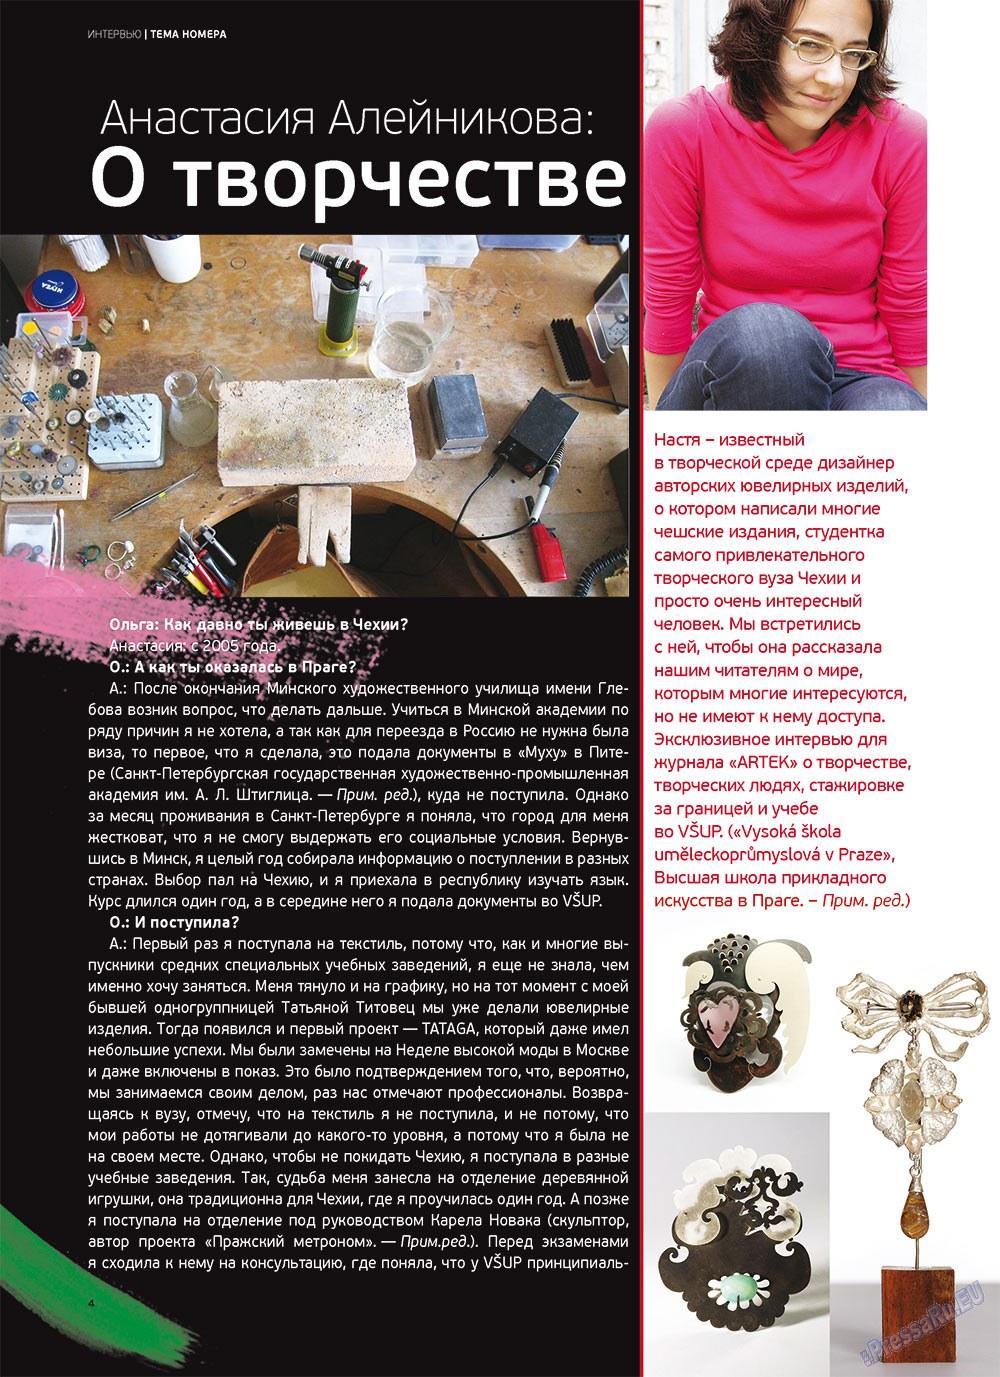 Артек (журнал). 2012 год, номер 3, стр. 6